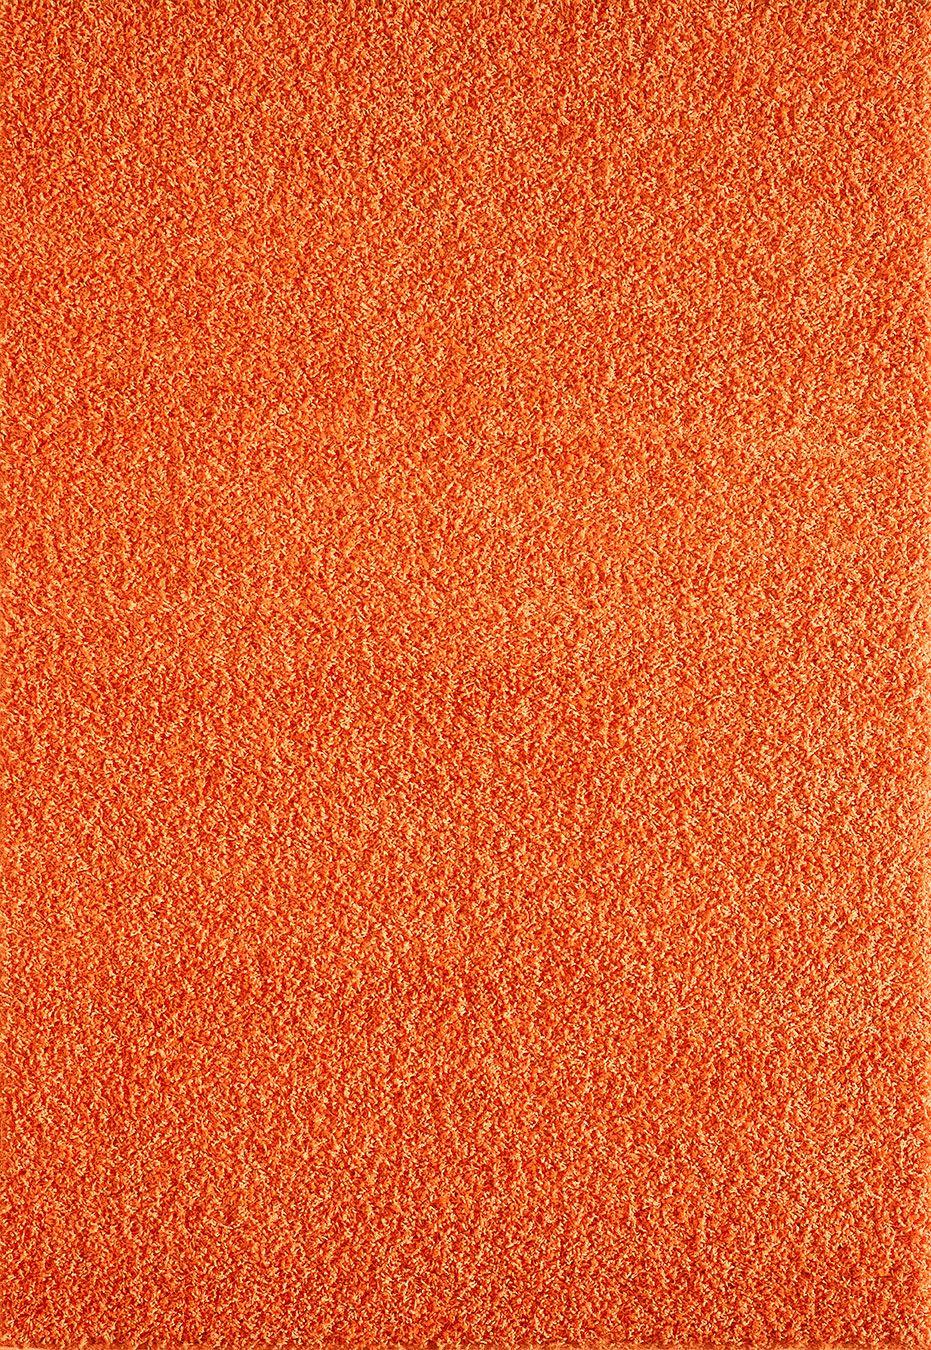 Orange Area Rug Shaggy Warm Soft Carpet Fluffy